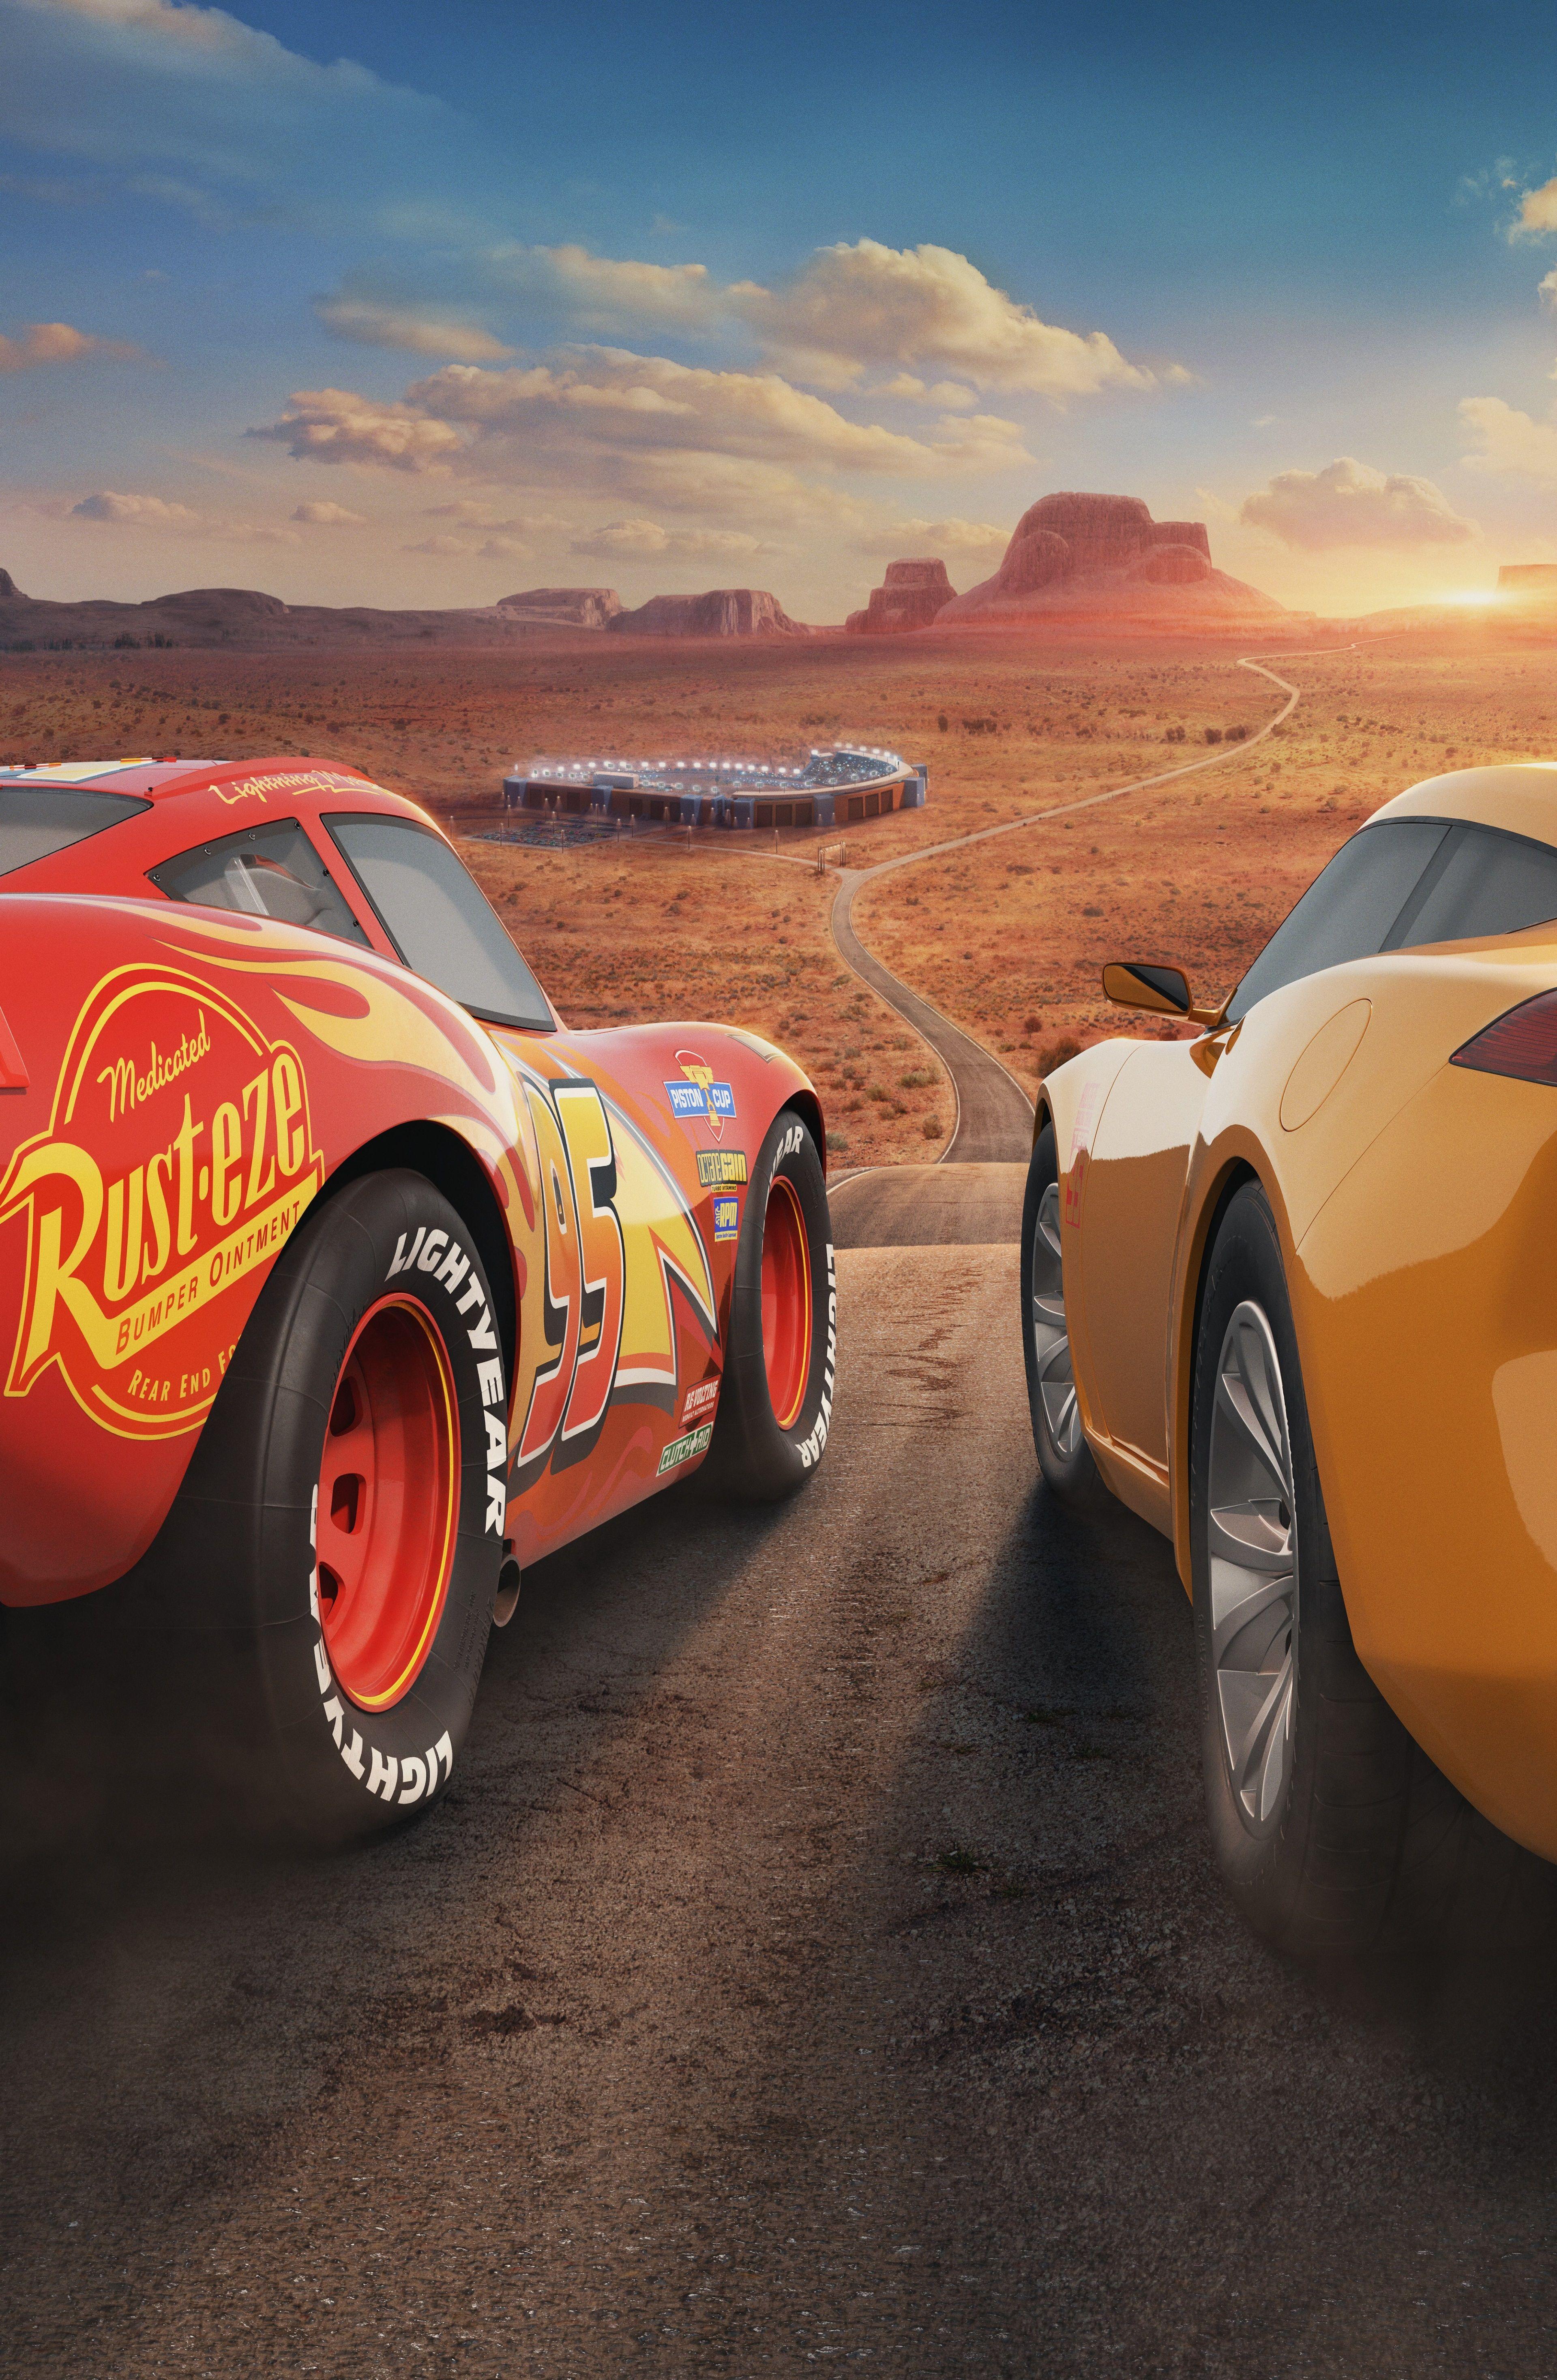 3840x5869 cars 3 4k desktop wallpaper hd Disney cars